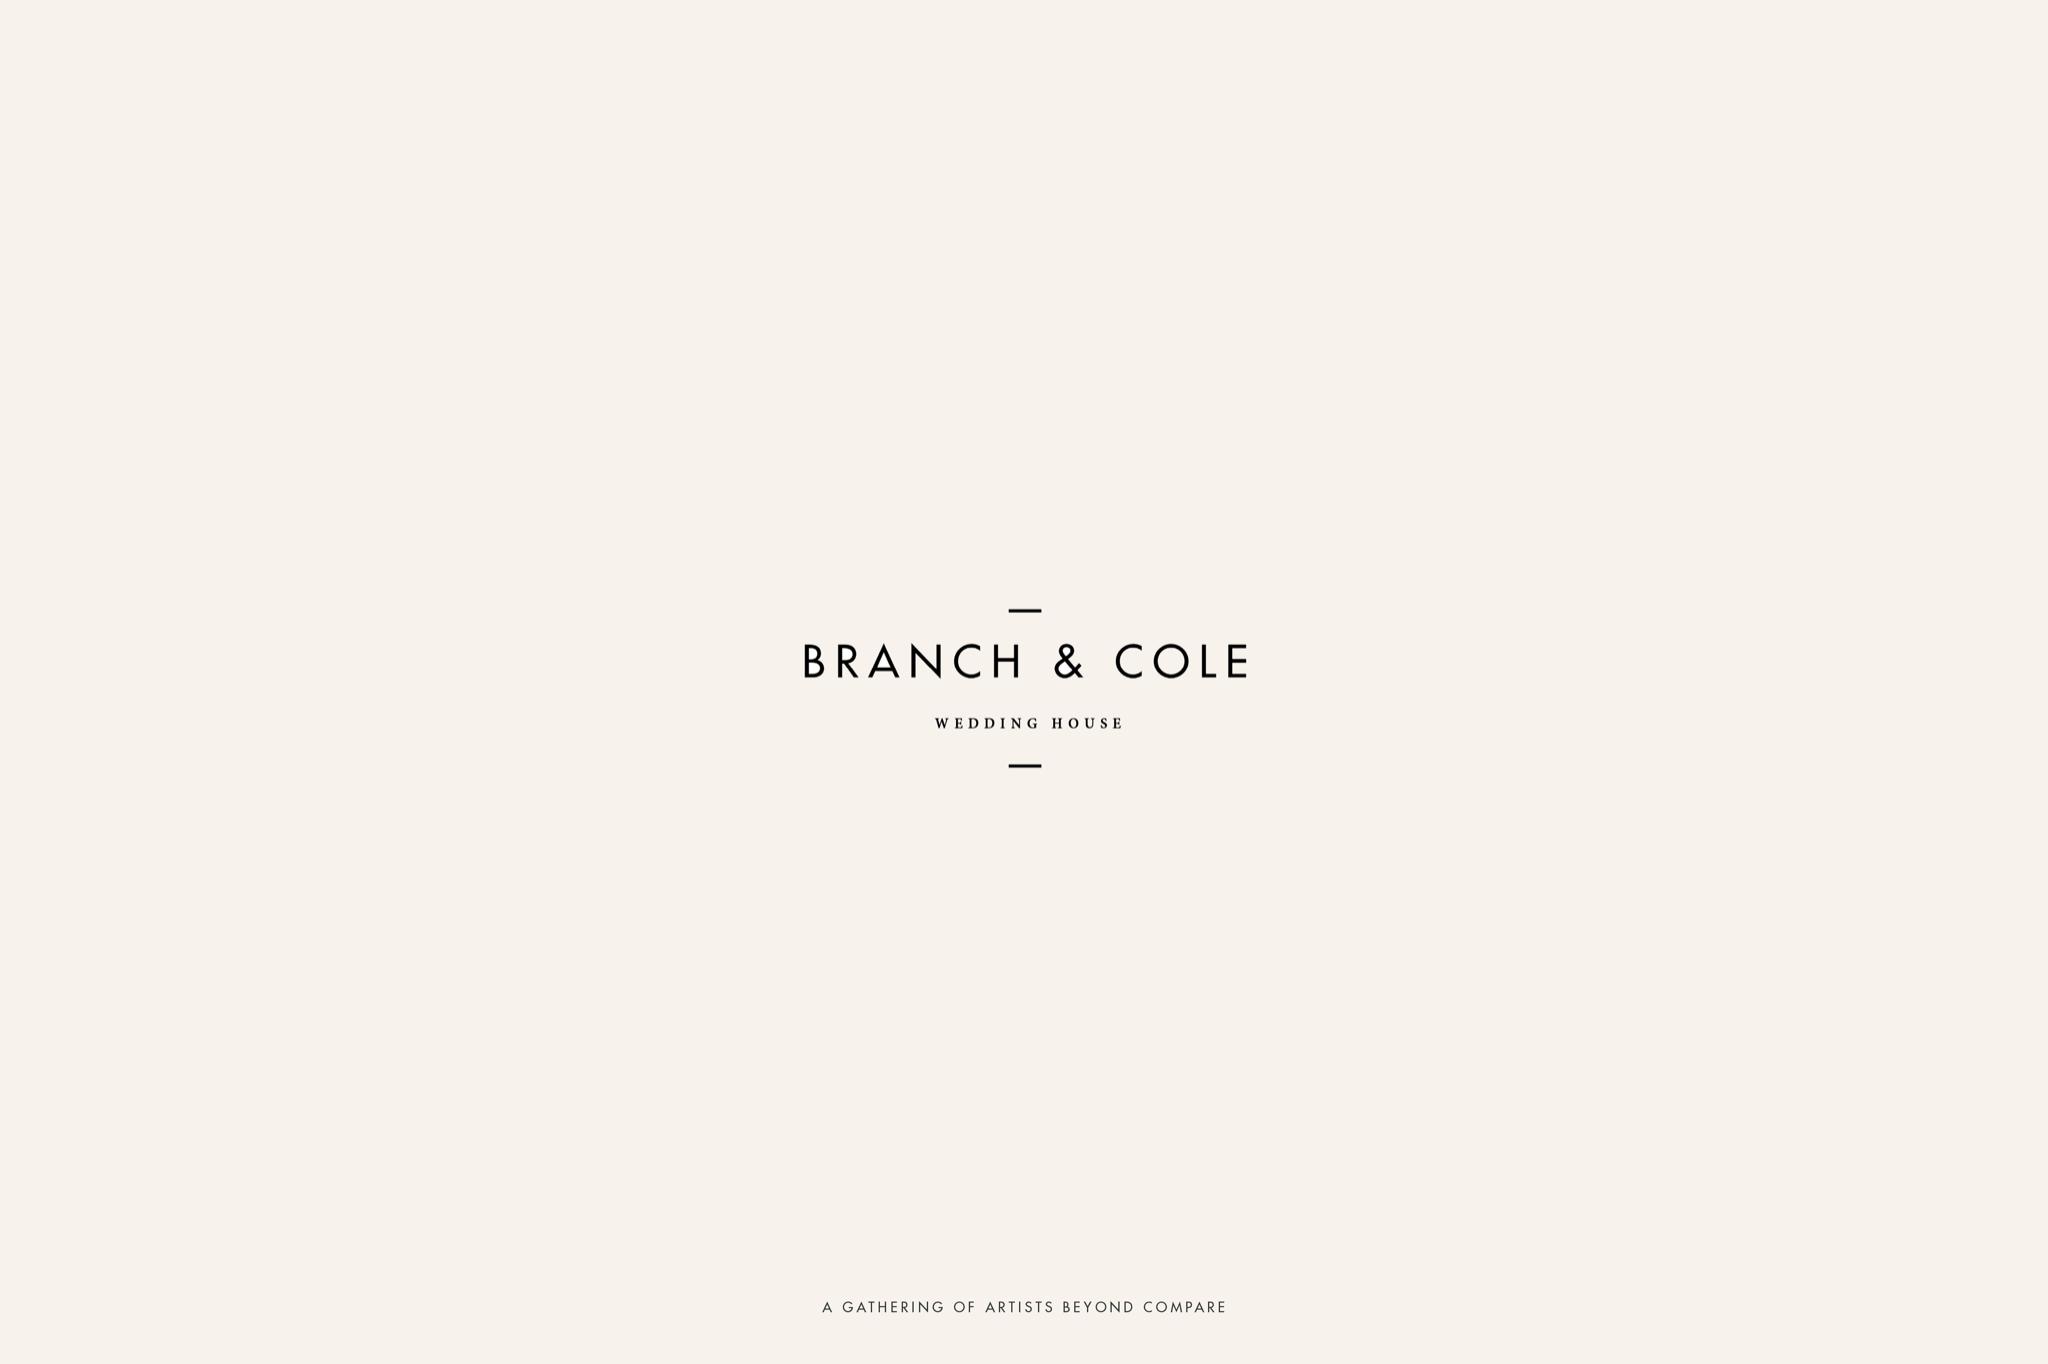 BranchAndCole_1.jpg